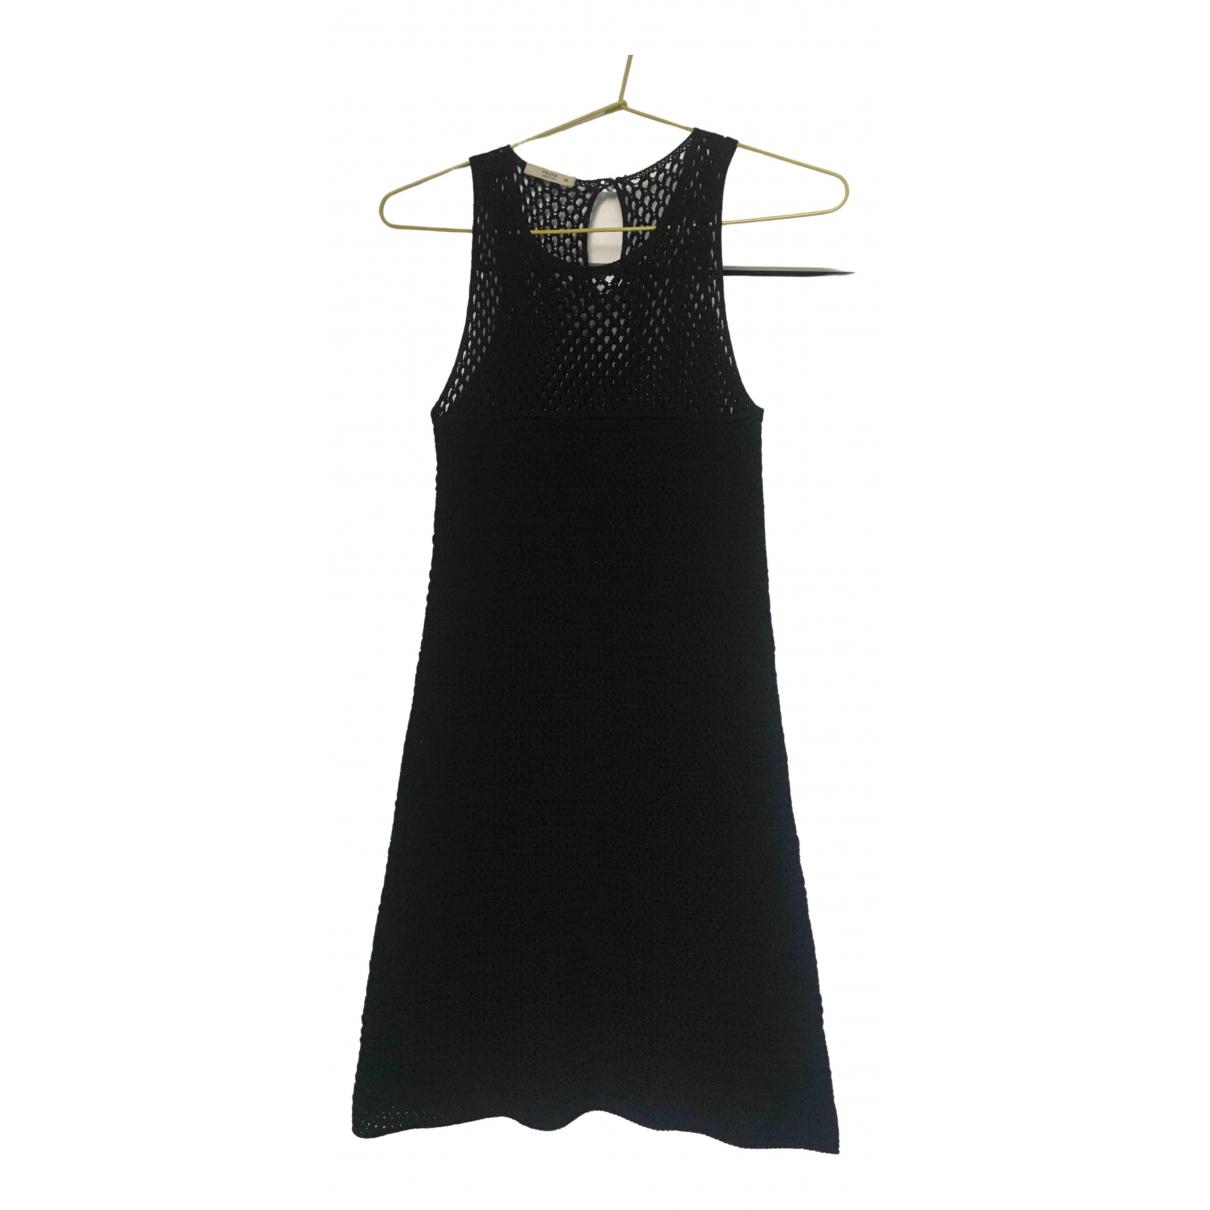 Prada \N Black Cotton dress for Women 34 FR